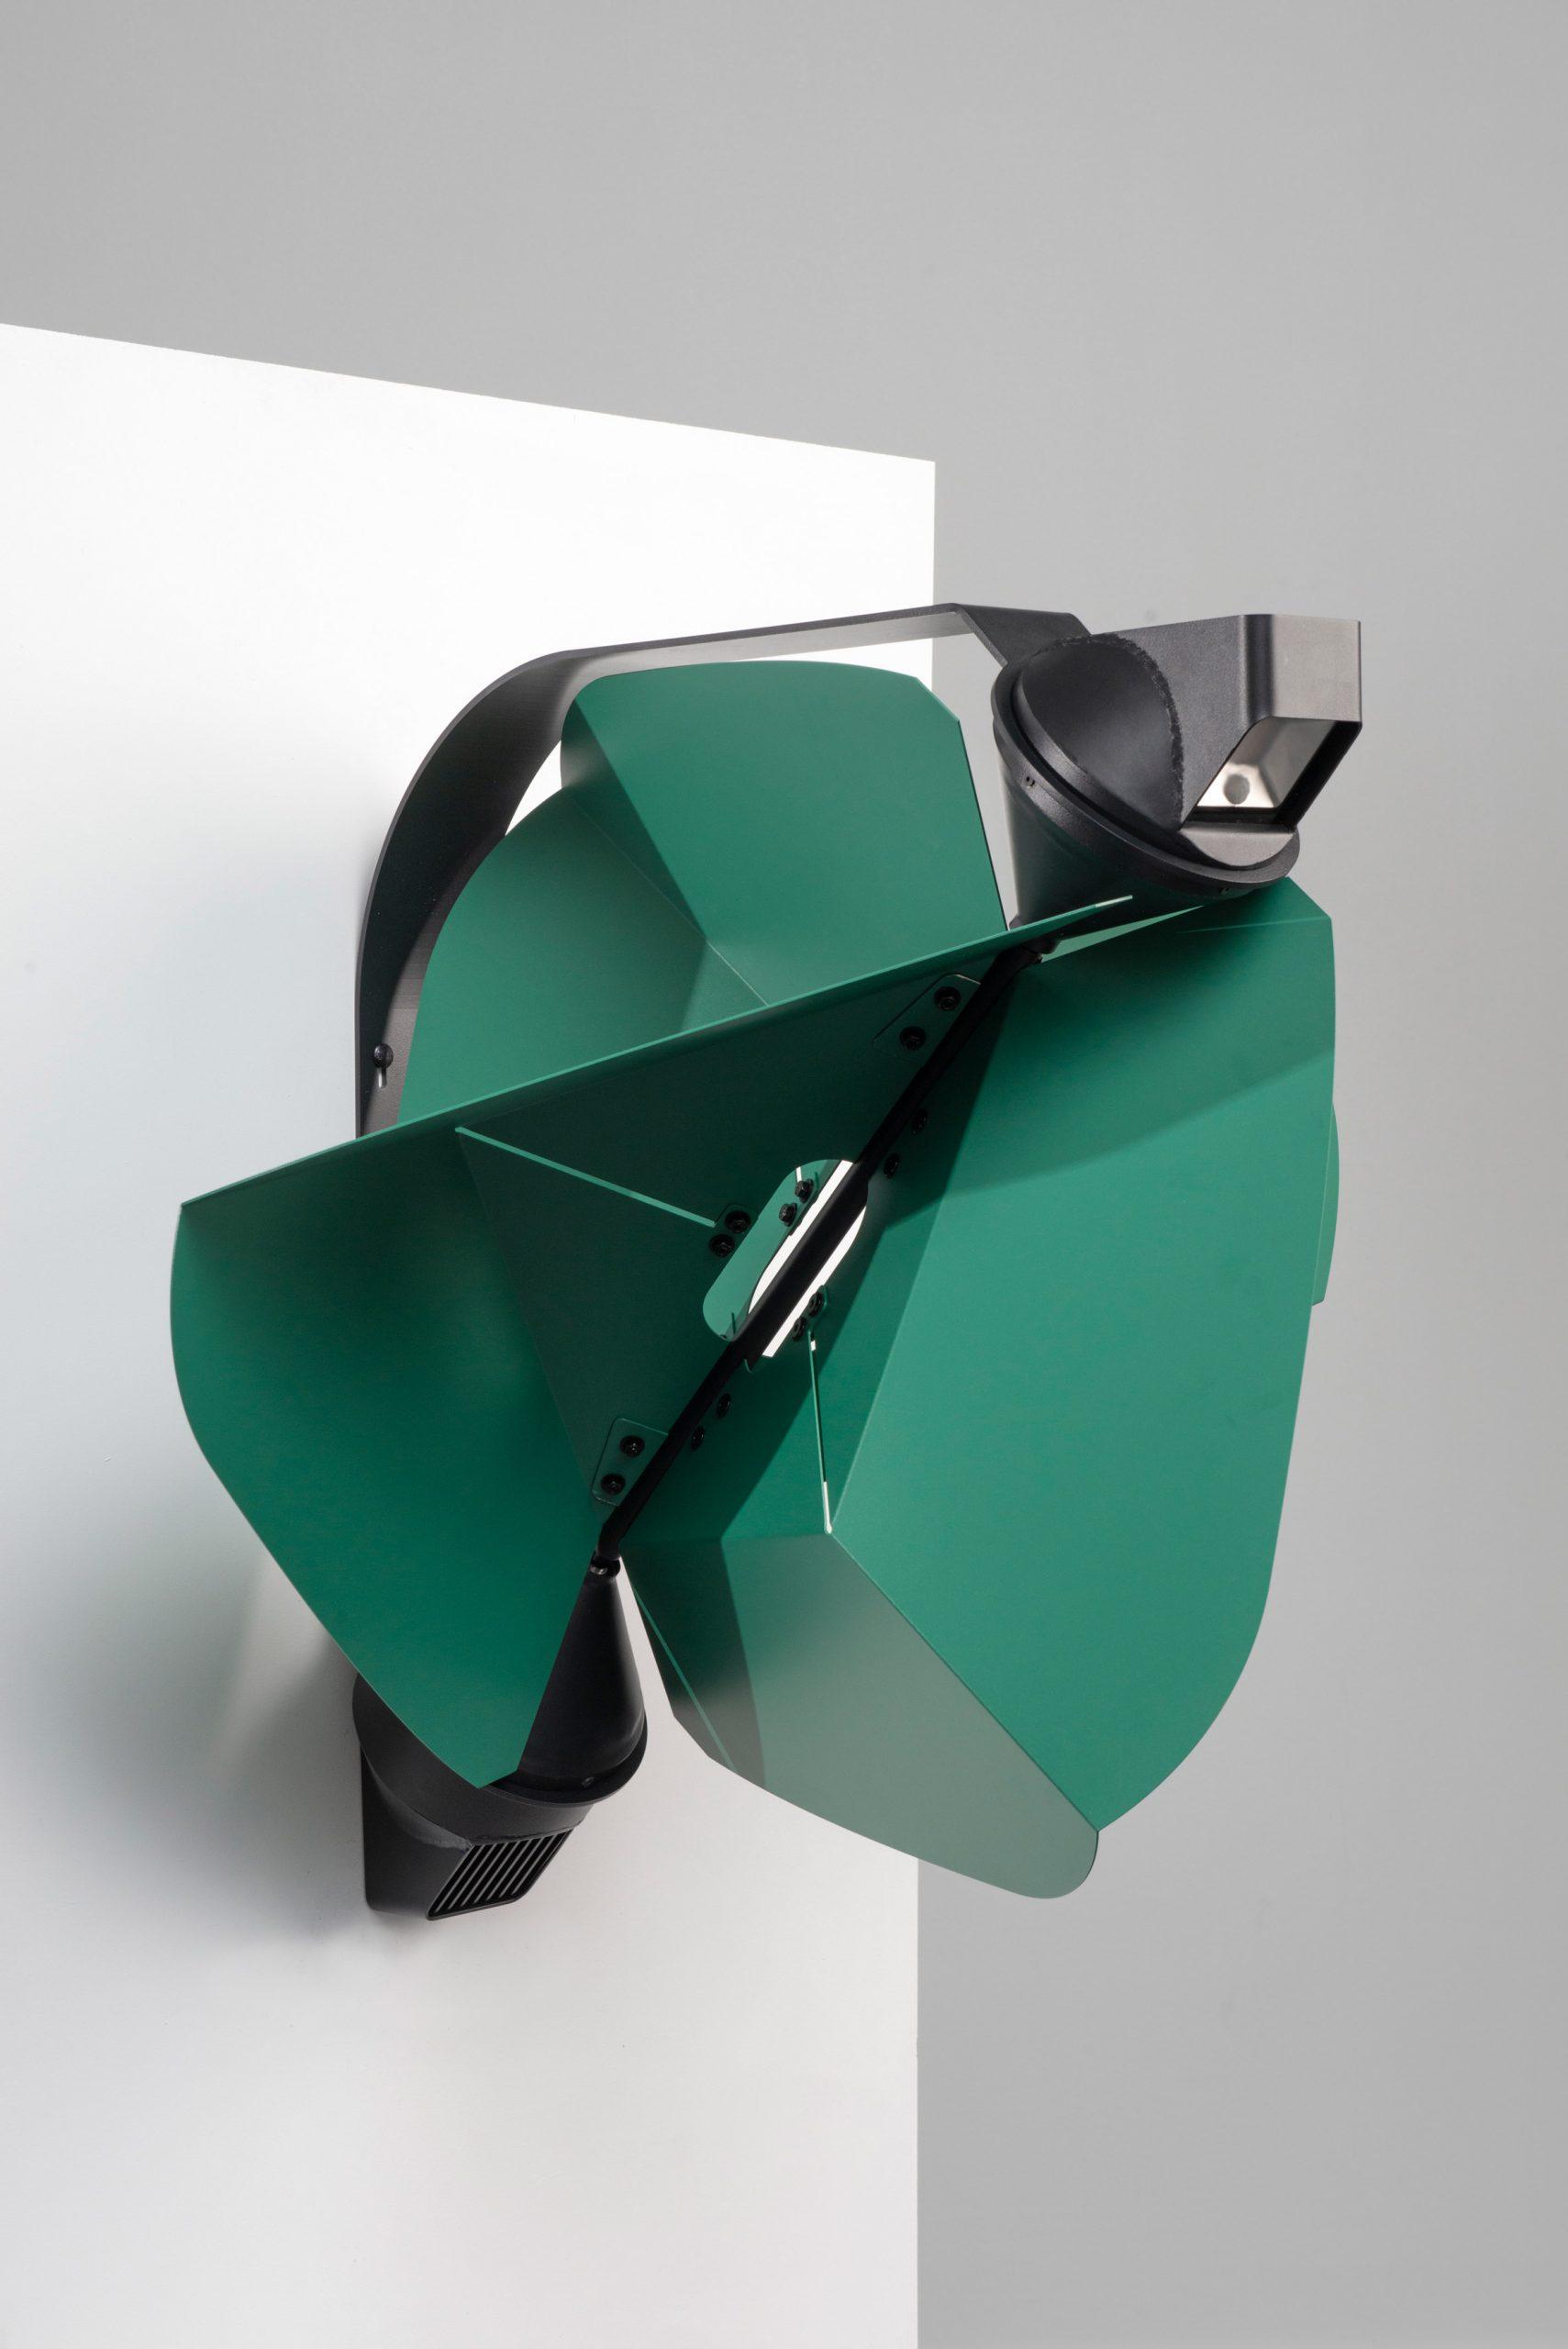 Wall-mounted Papilio light